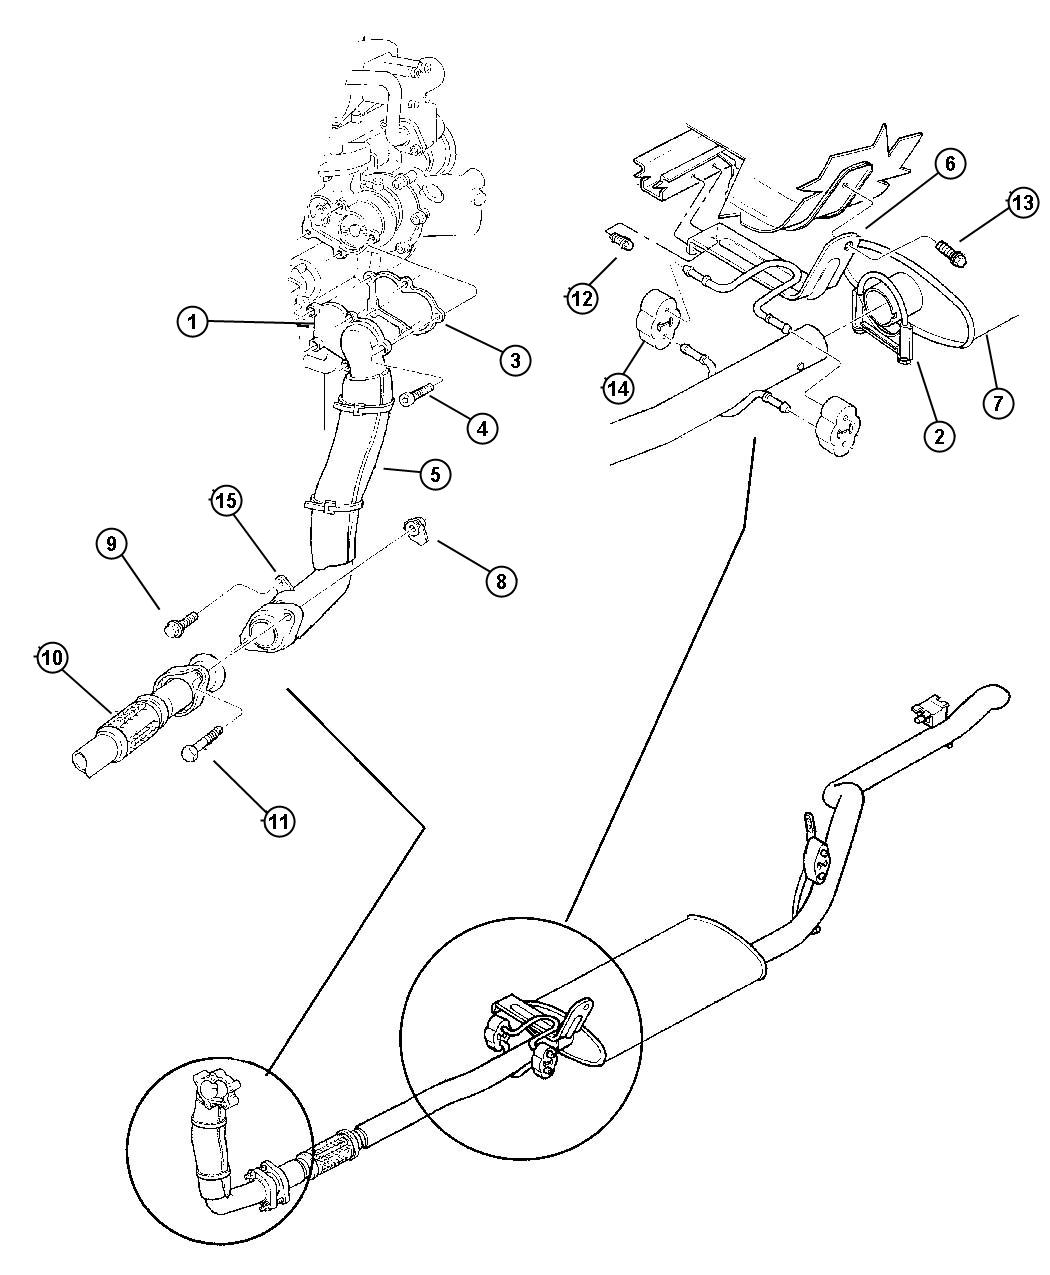 Jeep Cherokee Flange Exhaust Pipe Hanger Down Pipe